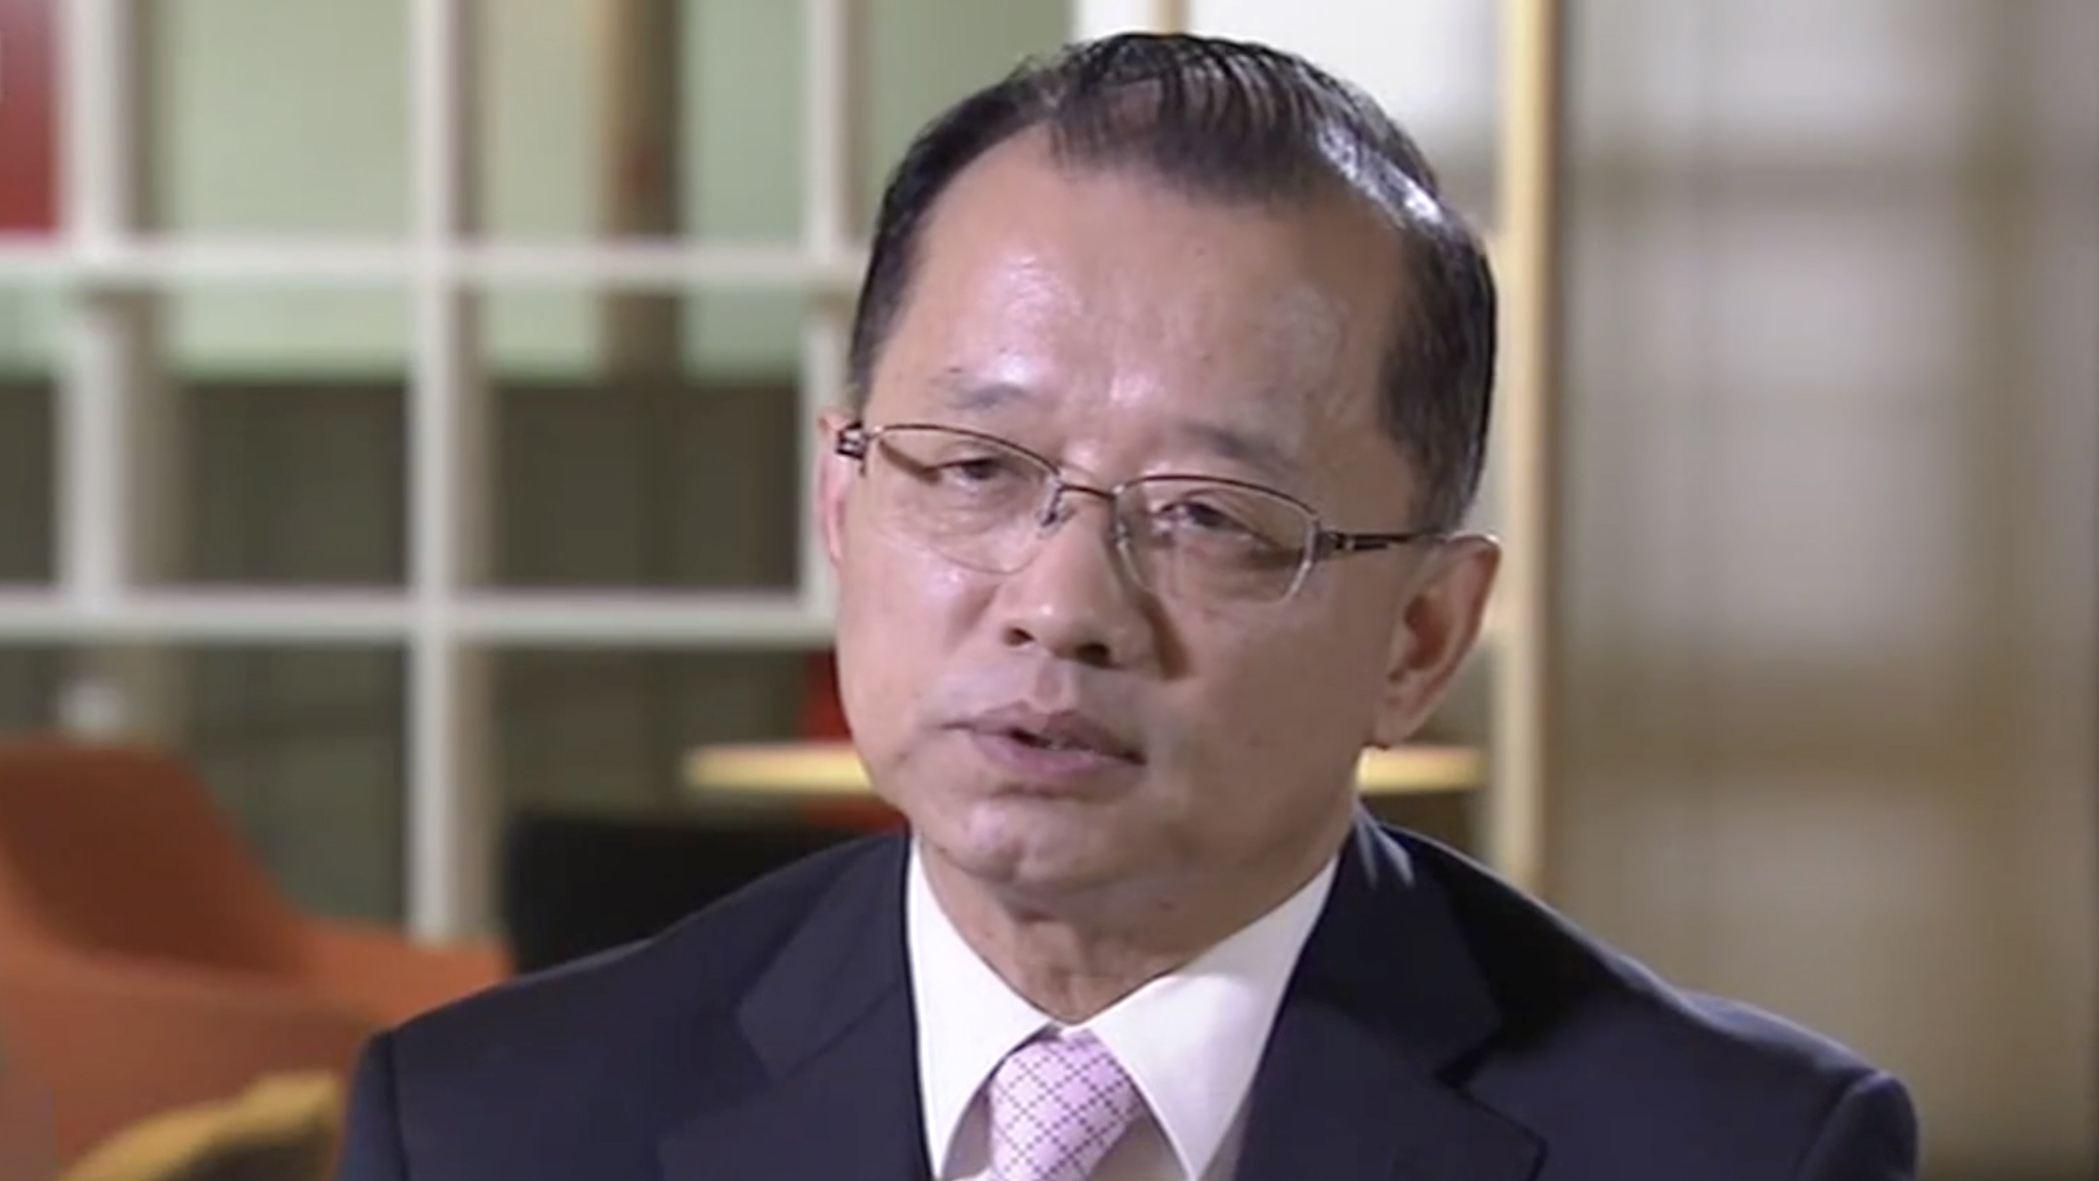 Liao Qun, chief economist of China Citic Bank. [Screenshot: CGTN]